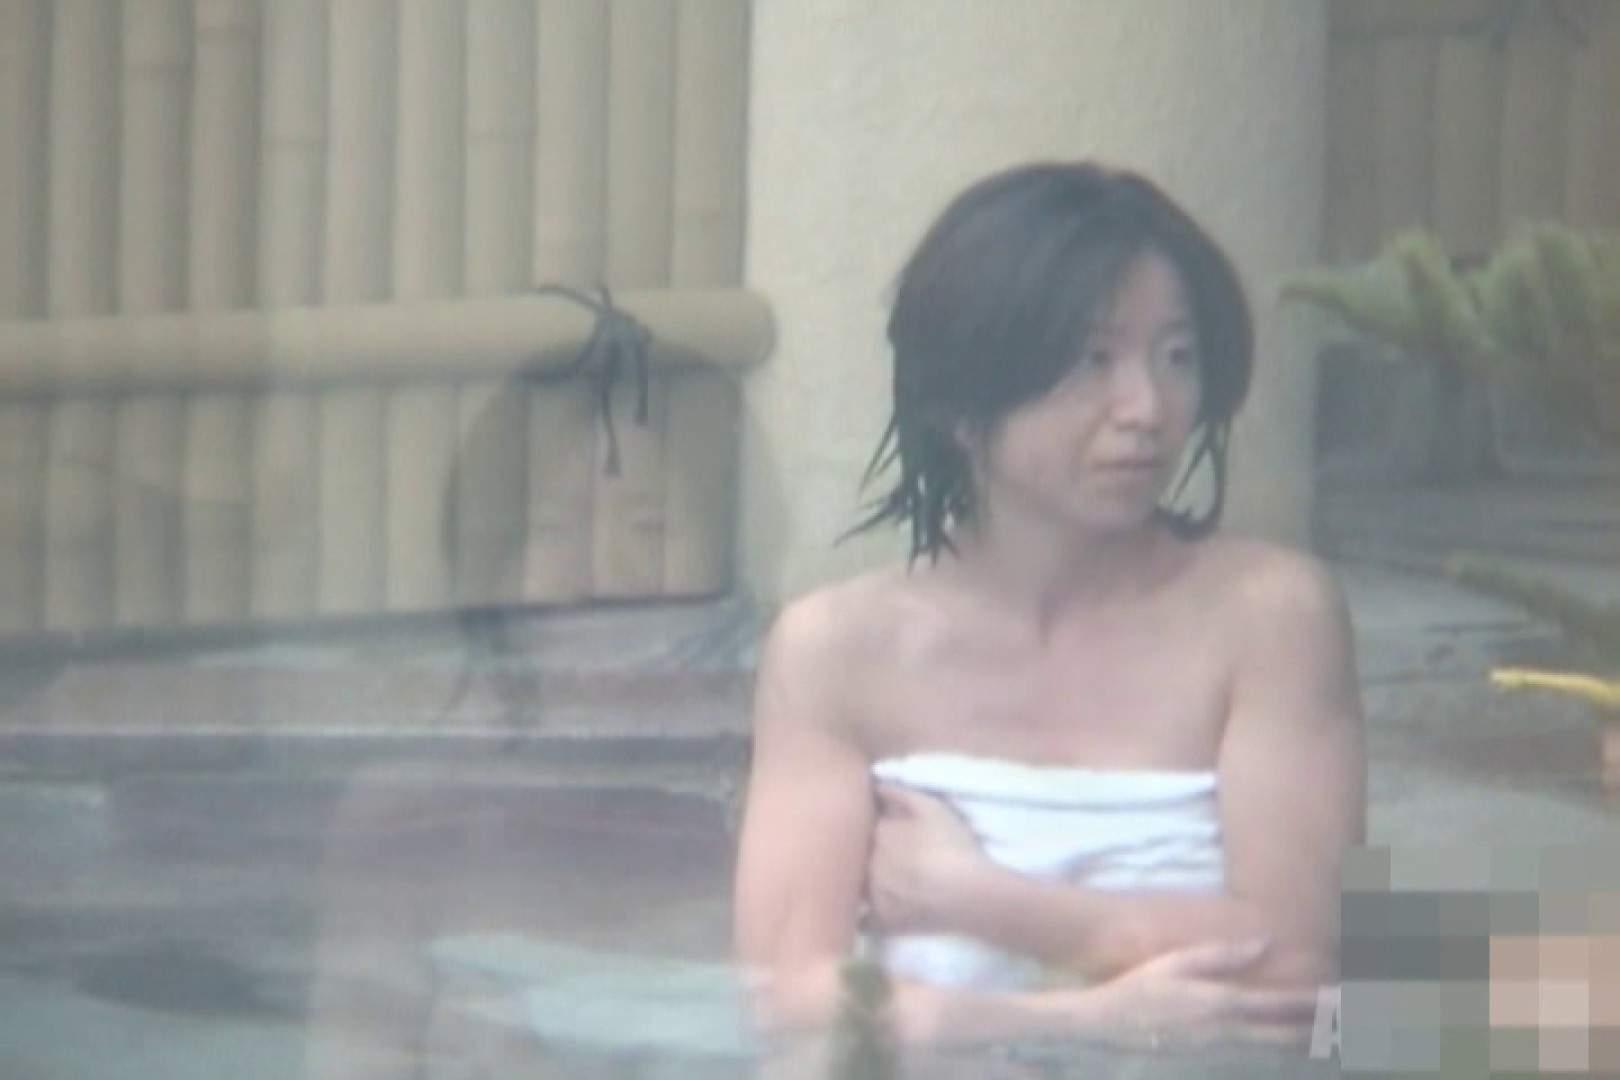 Aquaな露天風呂Vol.841 露天 戯れ無修正画像 49連発 49